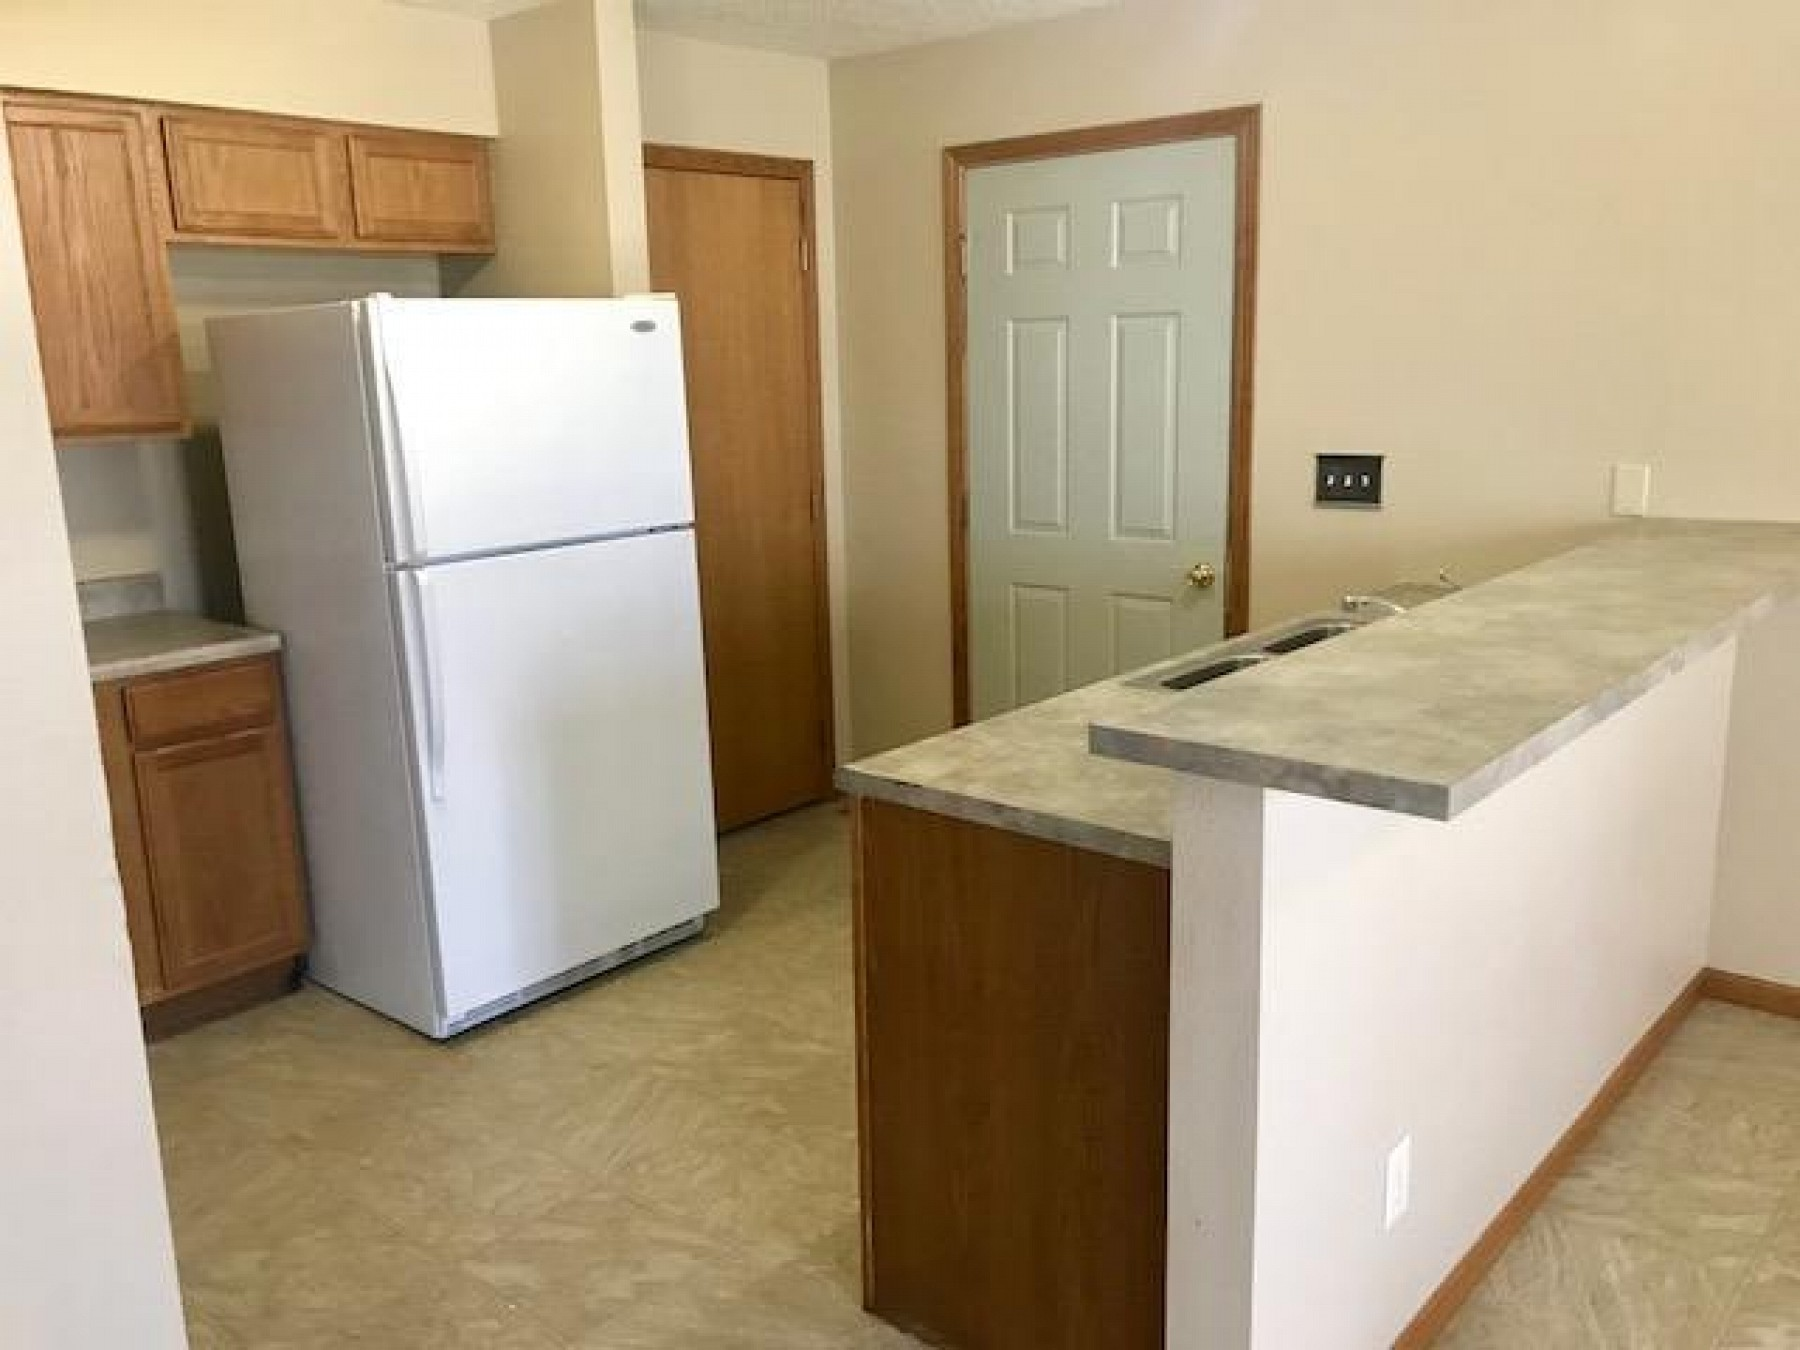 401 KelseyStreet, Elkton, SD 57026